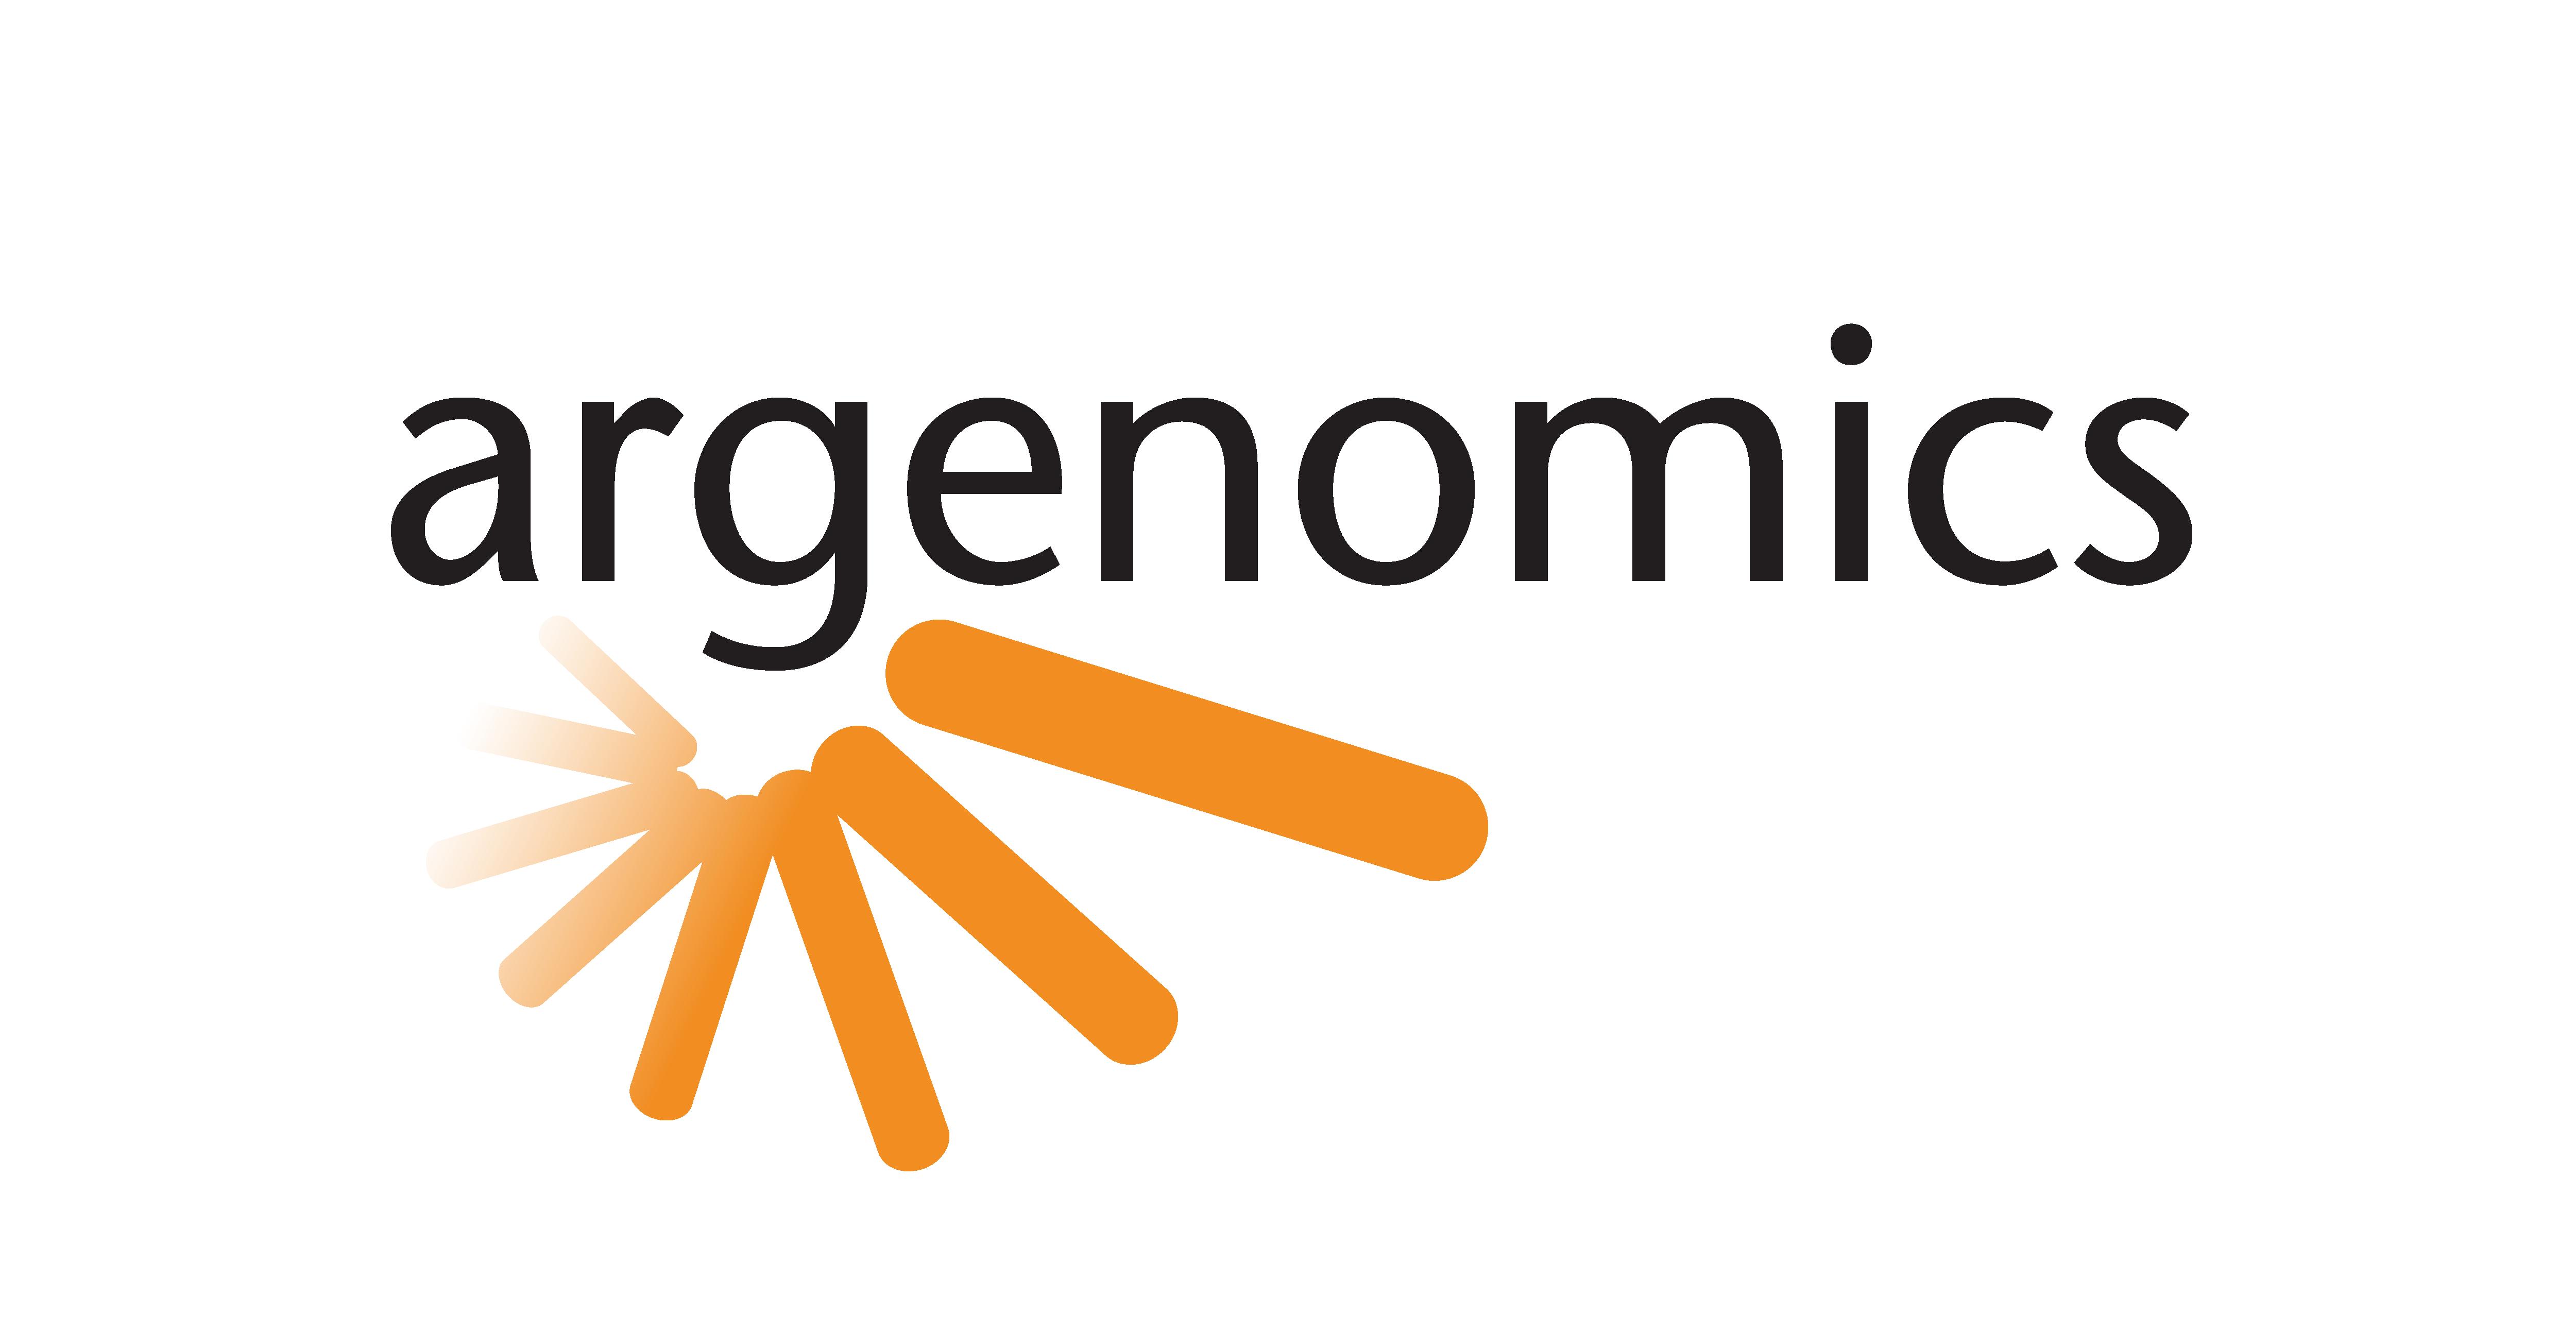 Argenomics